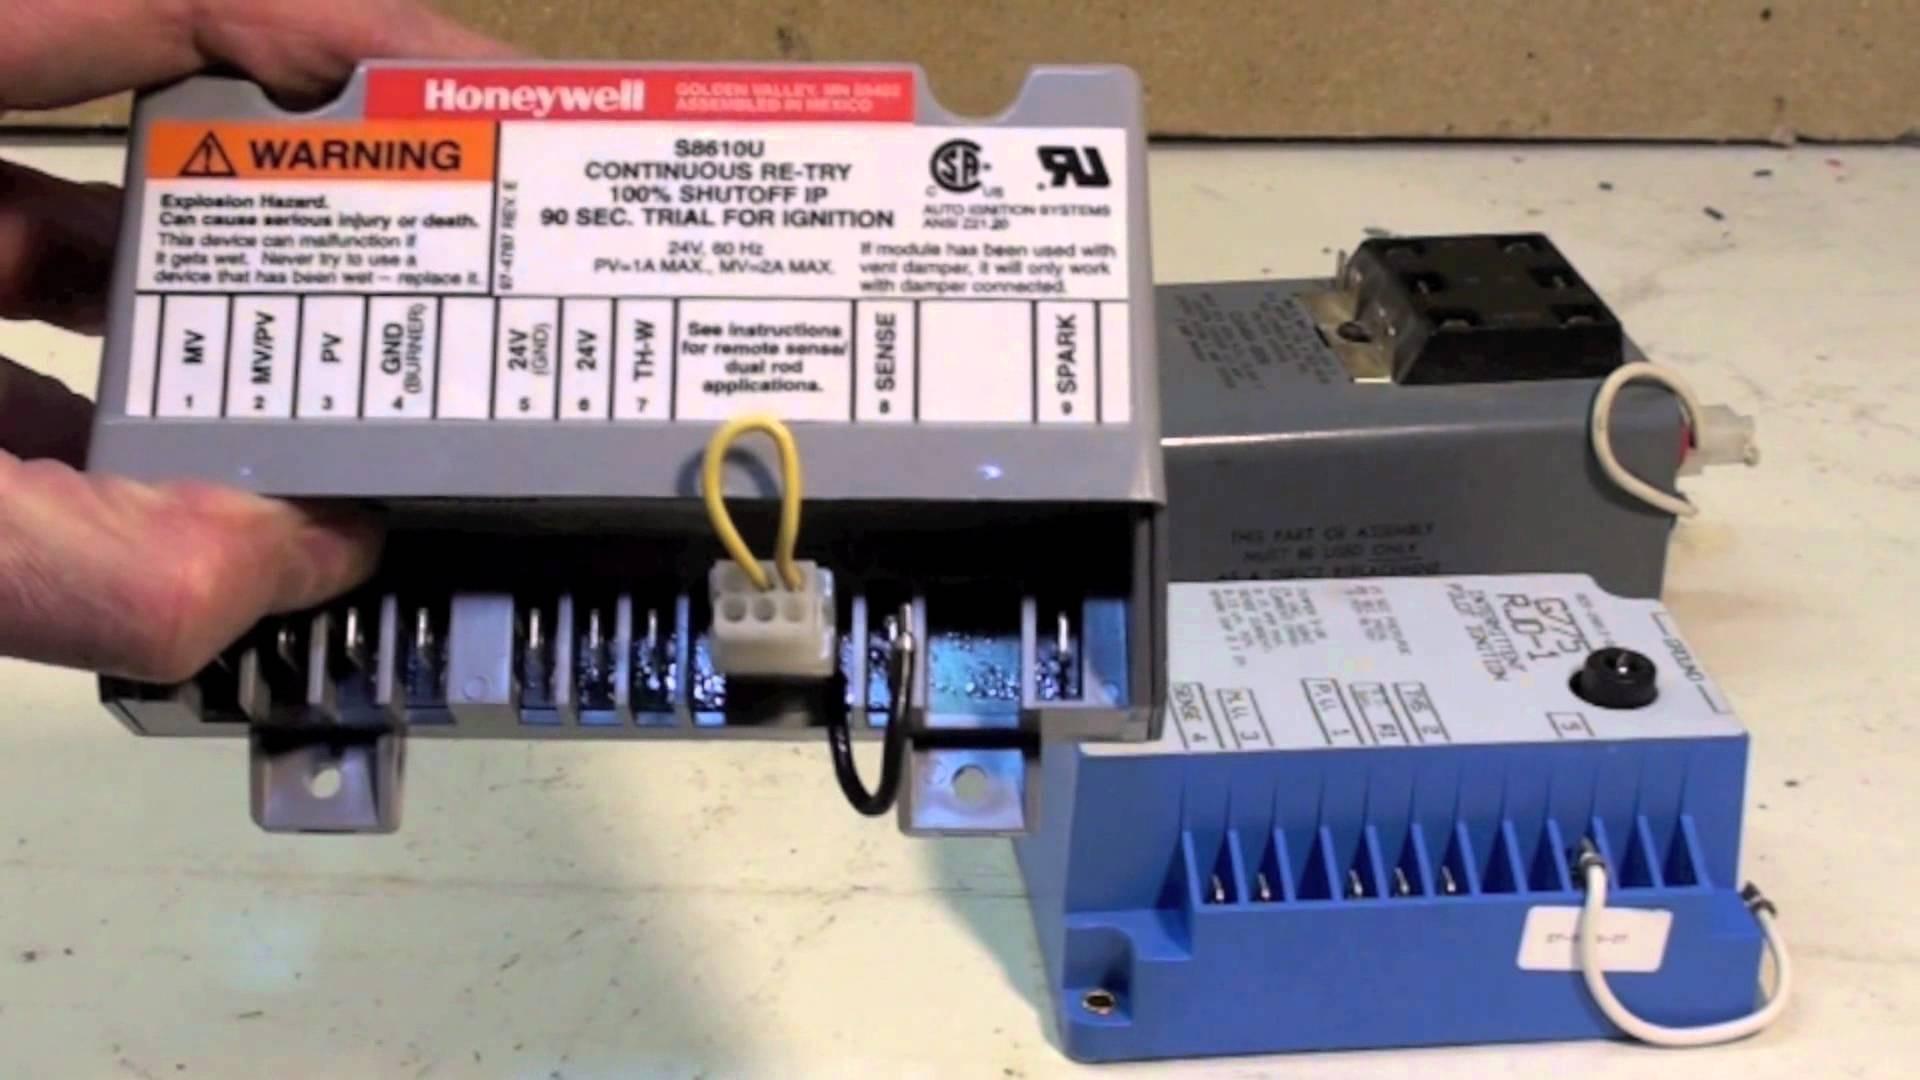 Honeywell S8610U Wiring Diagram | Wiring Library - Honeywell S8610U Wiring Diagram